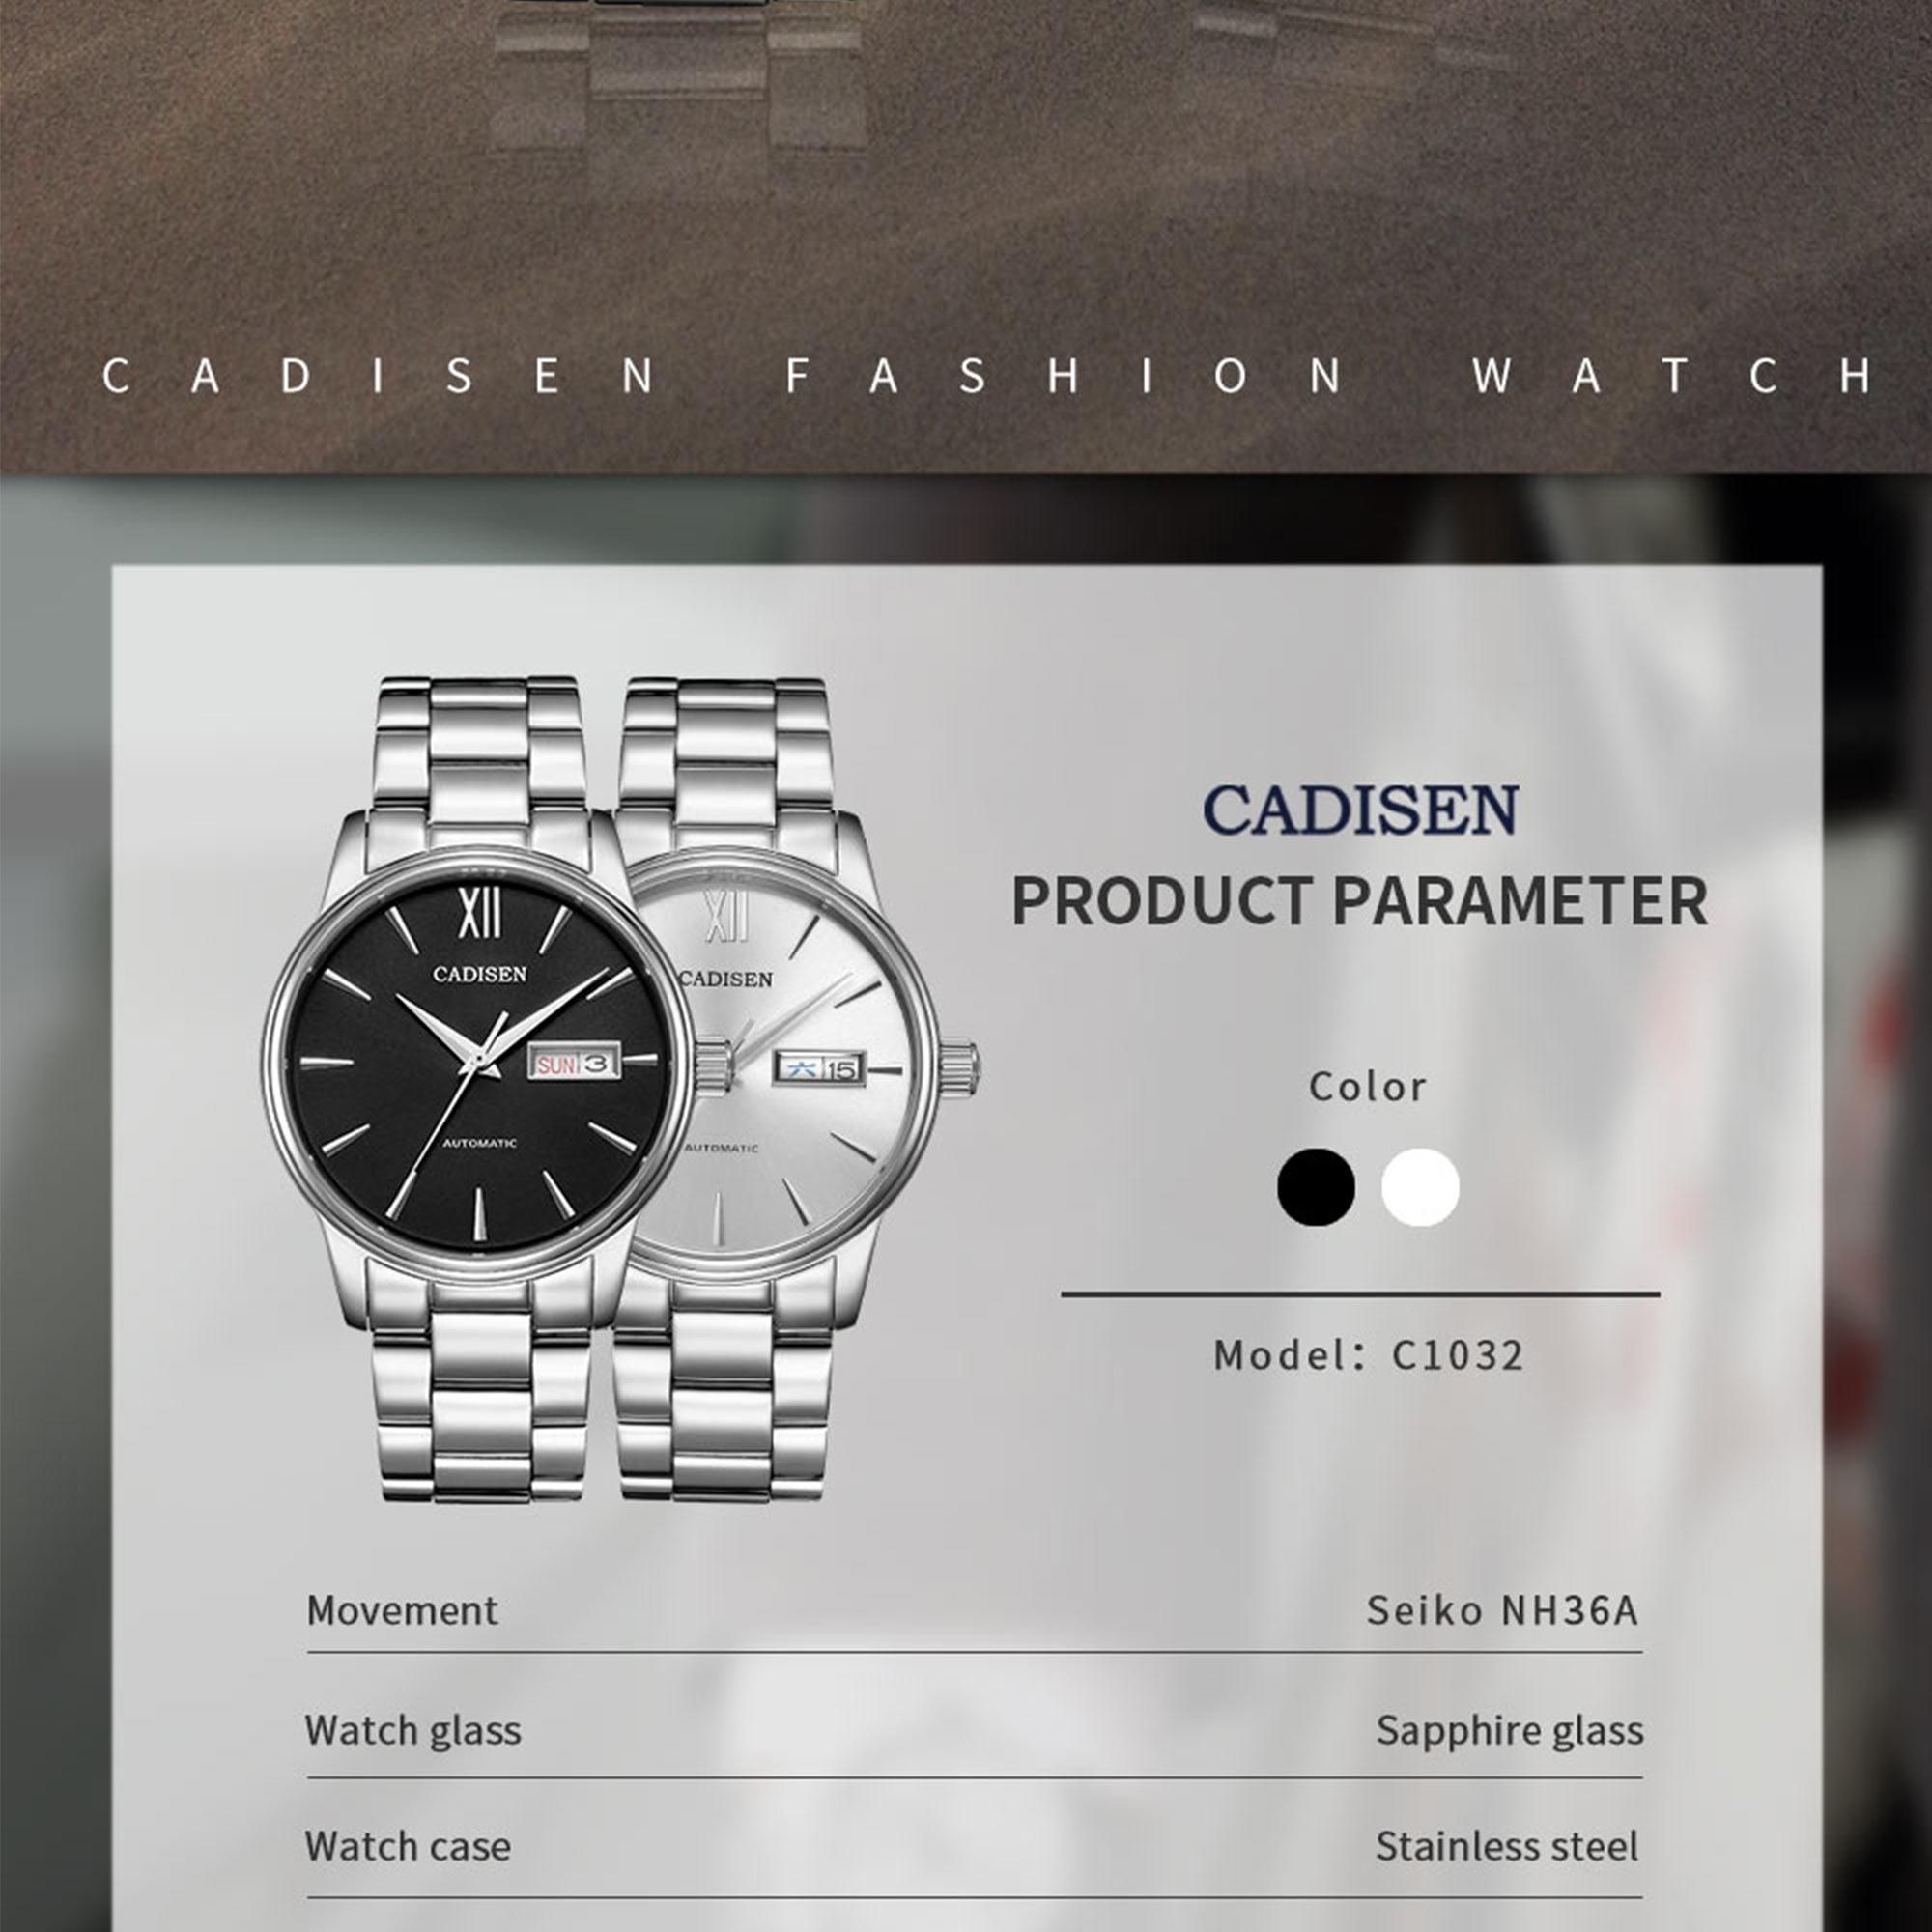 H469471844f3844b7affbb81a1aa5d71fH CADISEN Men Watch Automatic Mechanical Watches Role Date Week Top Luxury Brand Japan NH36A Wrist watch Clock Relogio Masculino